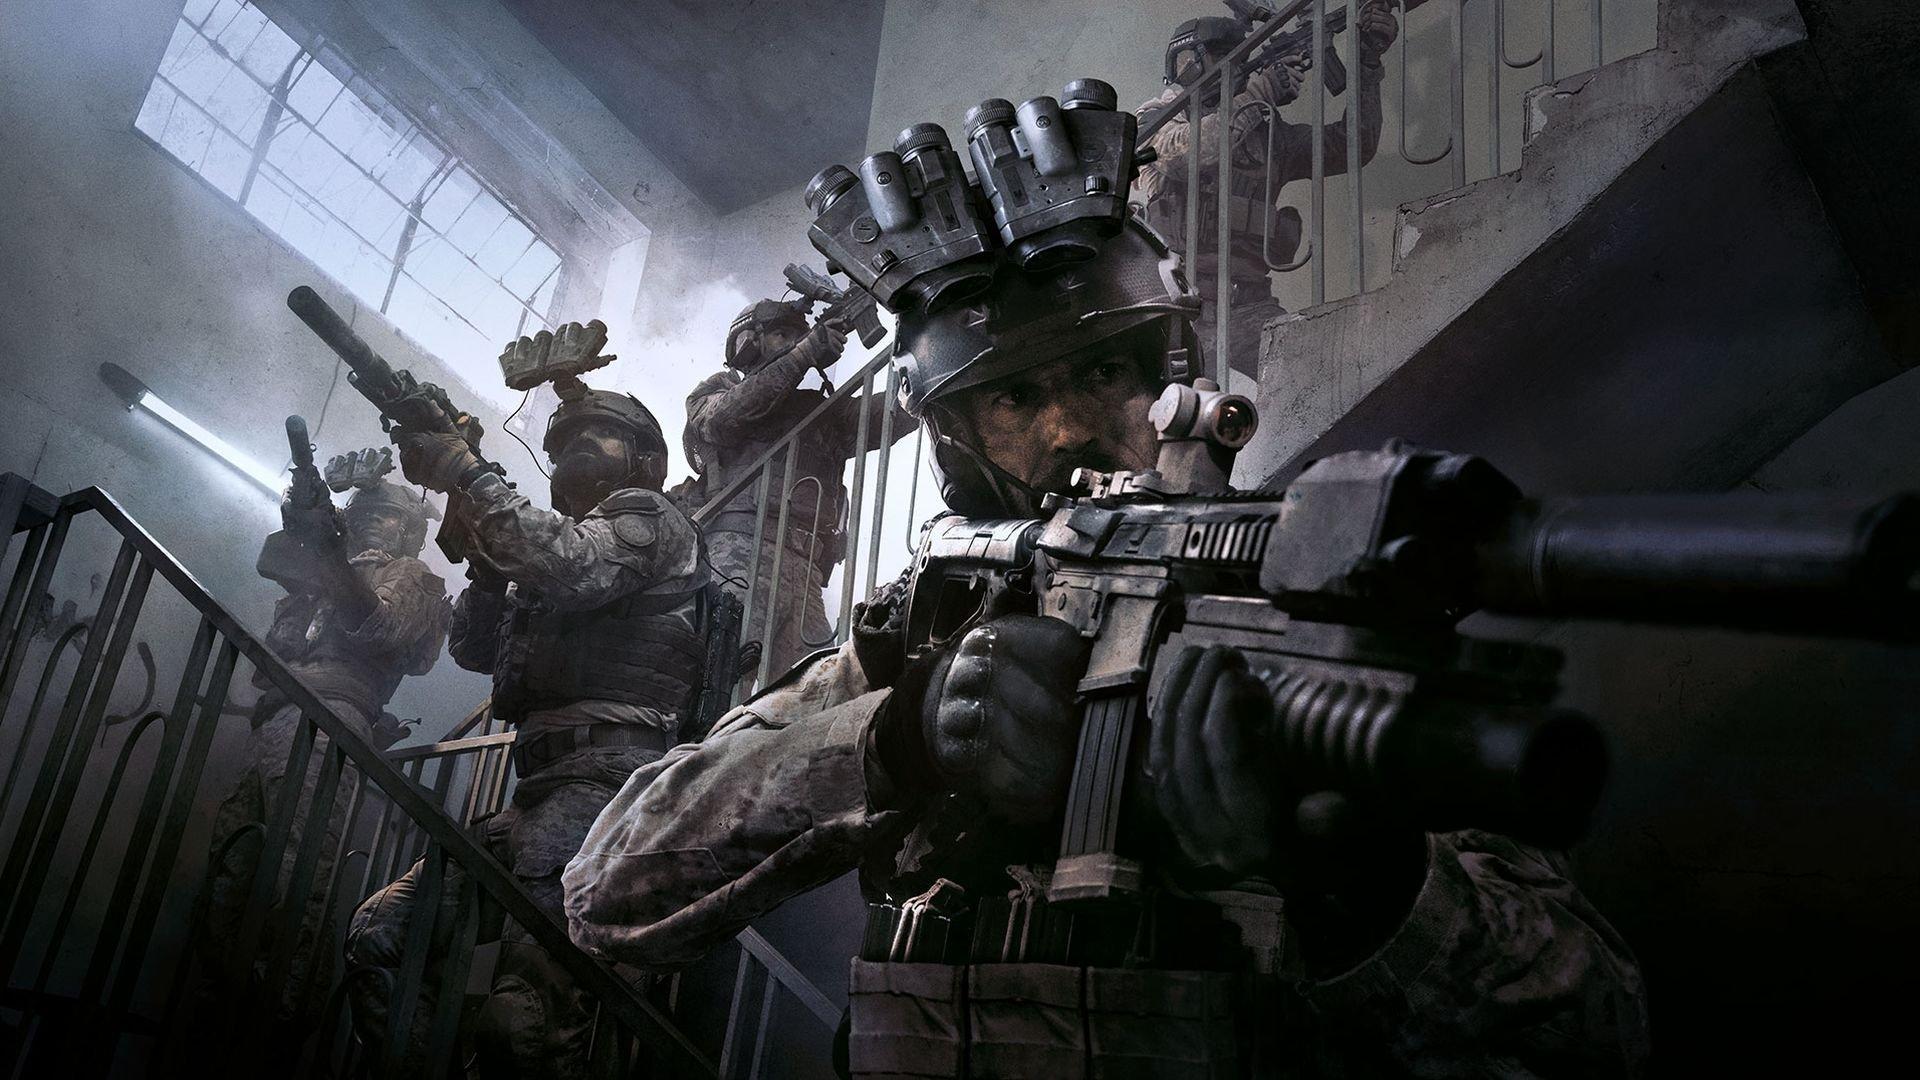 Call of Duty: Modern Warfare Season 3 kicks off next week